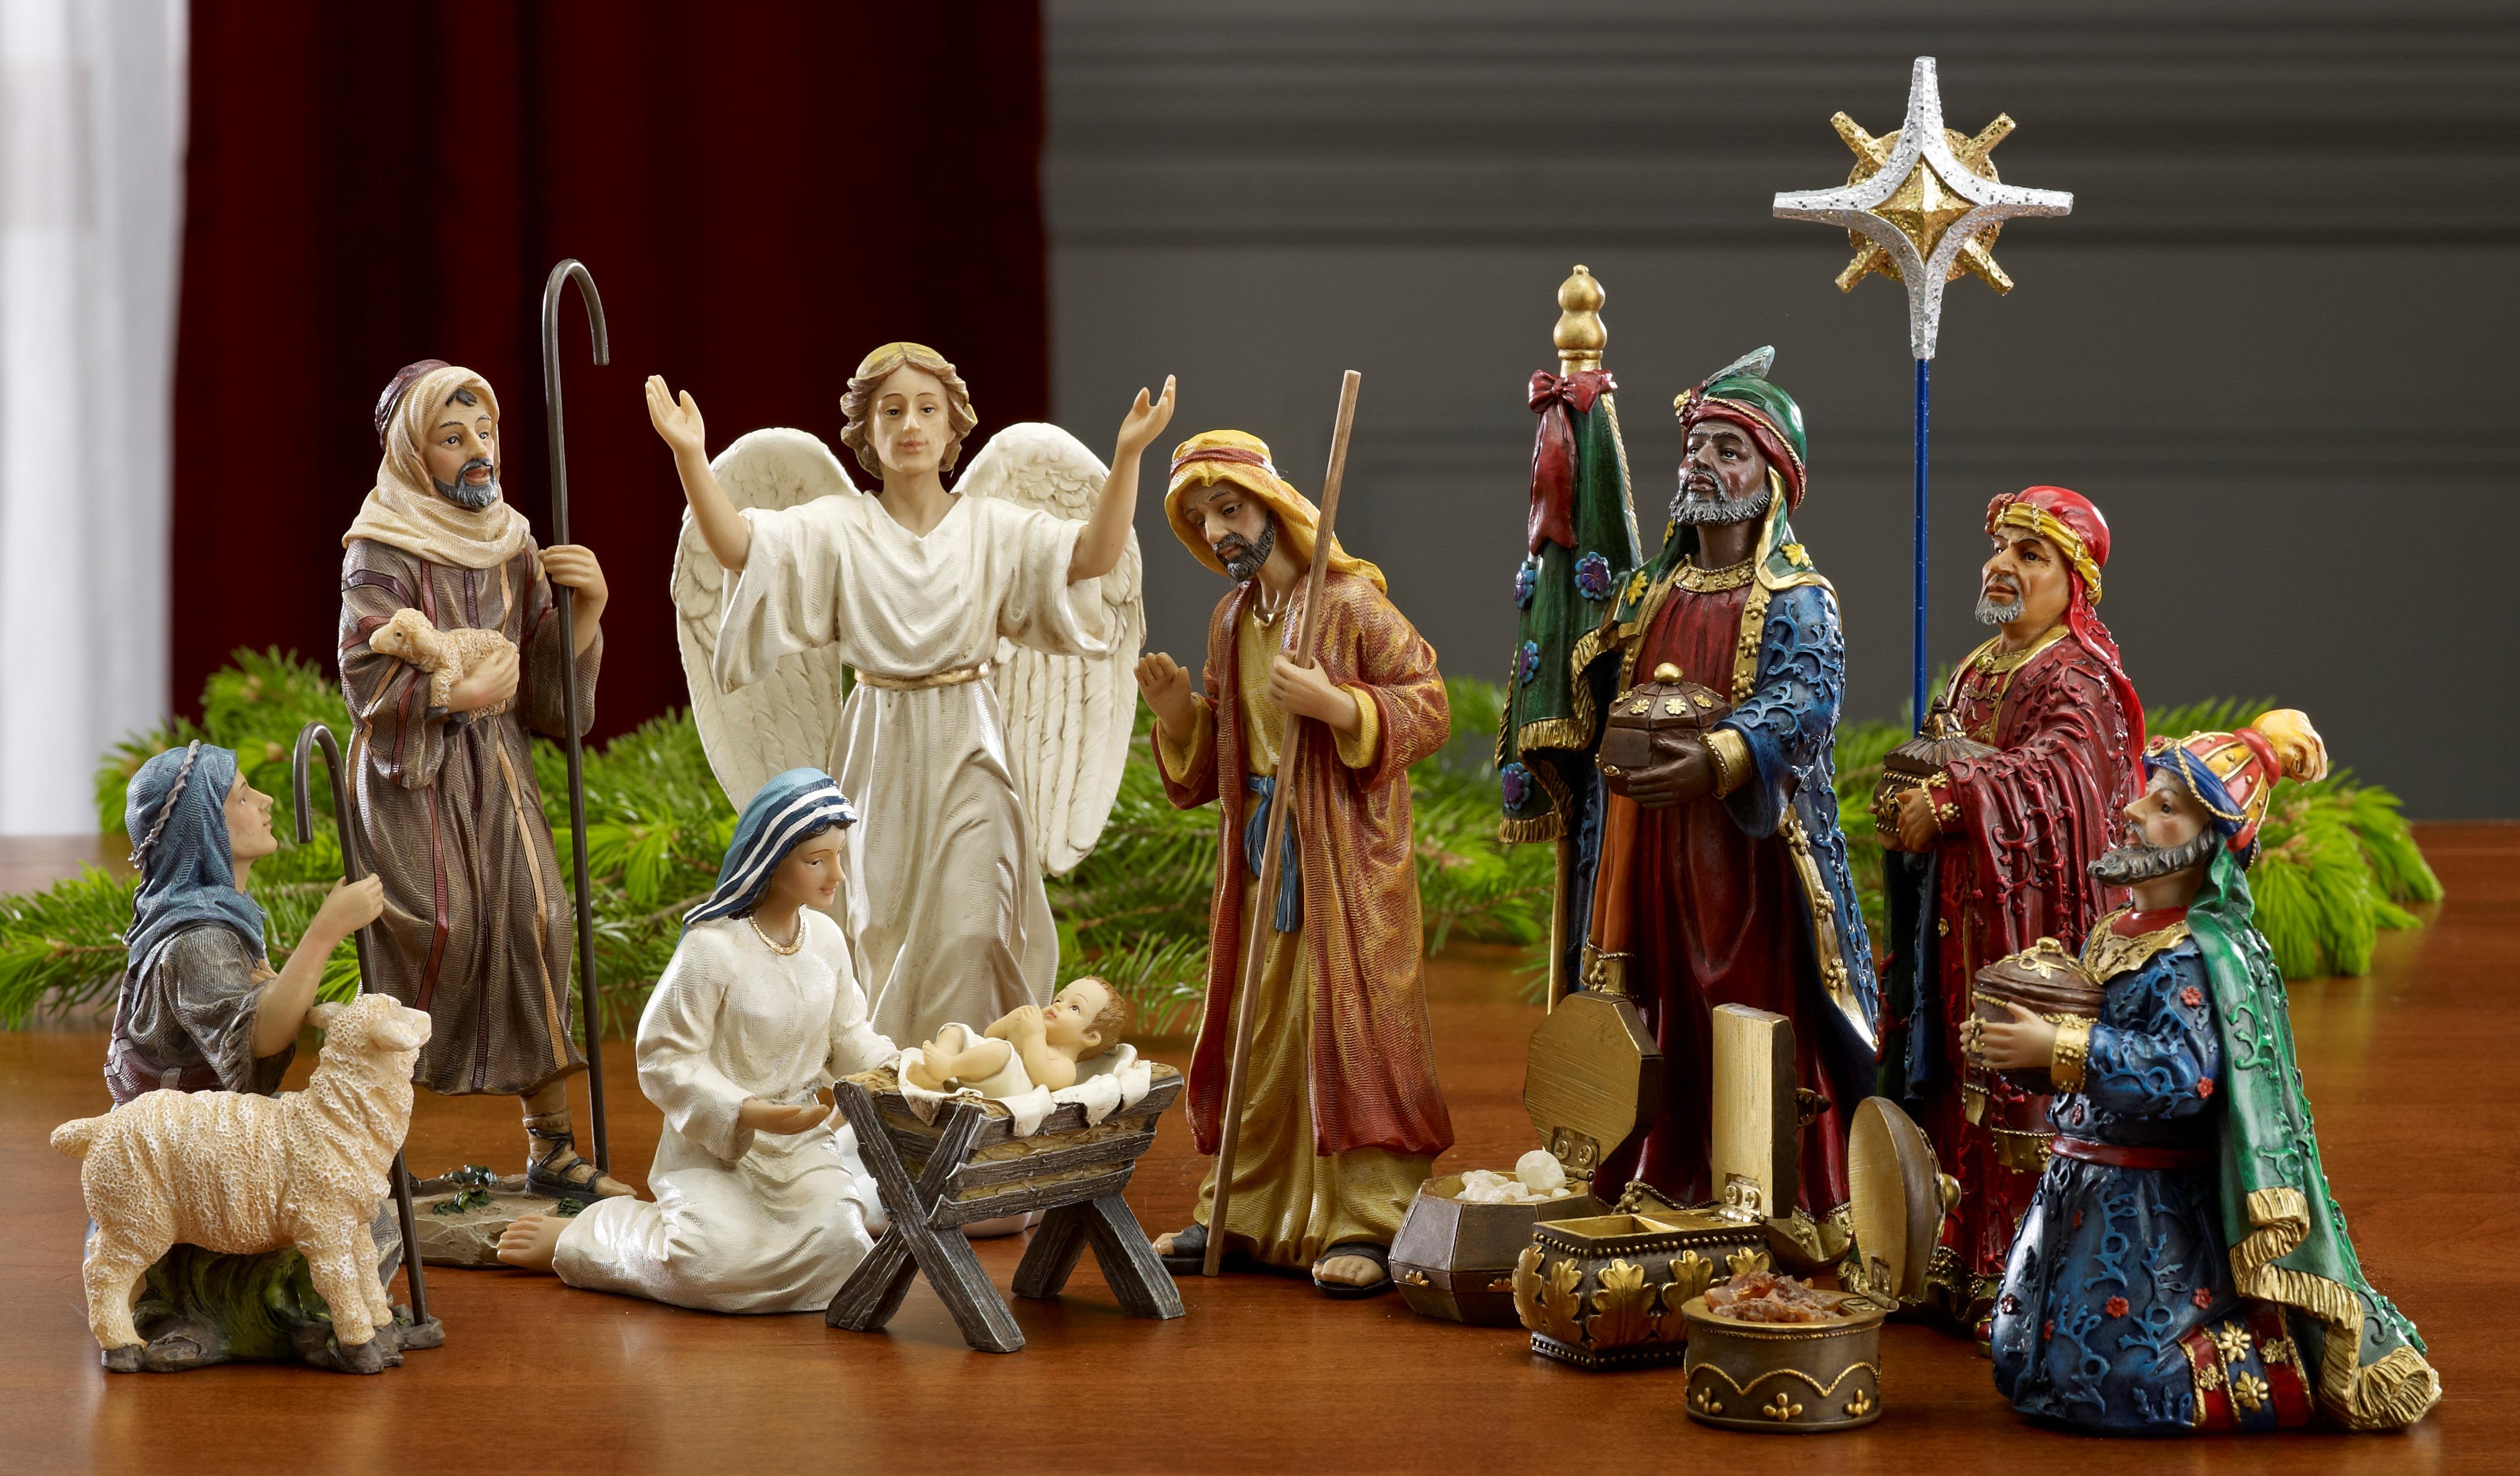 Animal Figurines Home Decor 7 Inch Real Life Nativity